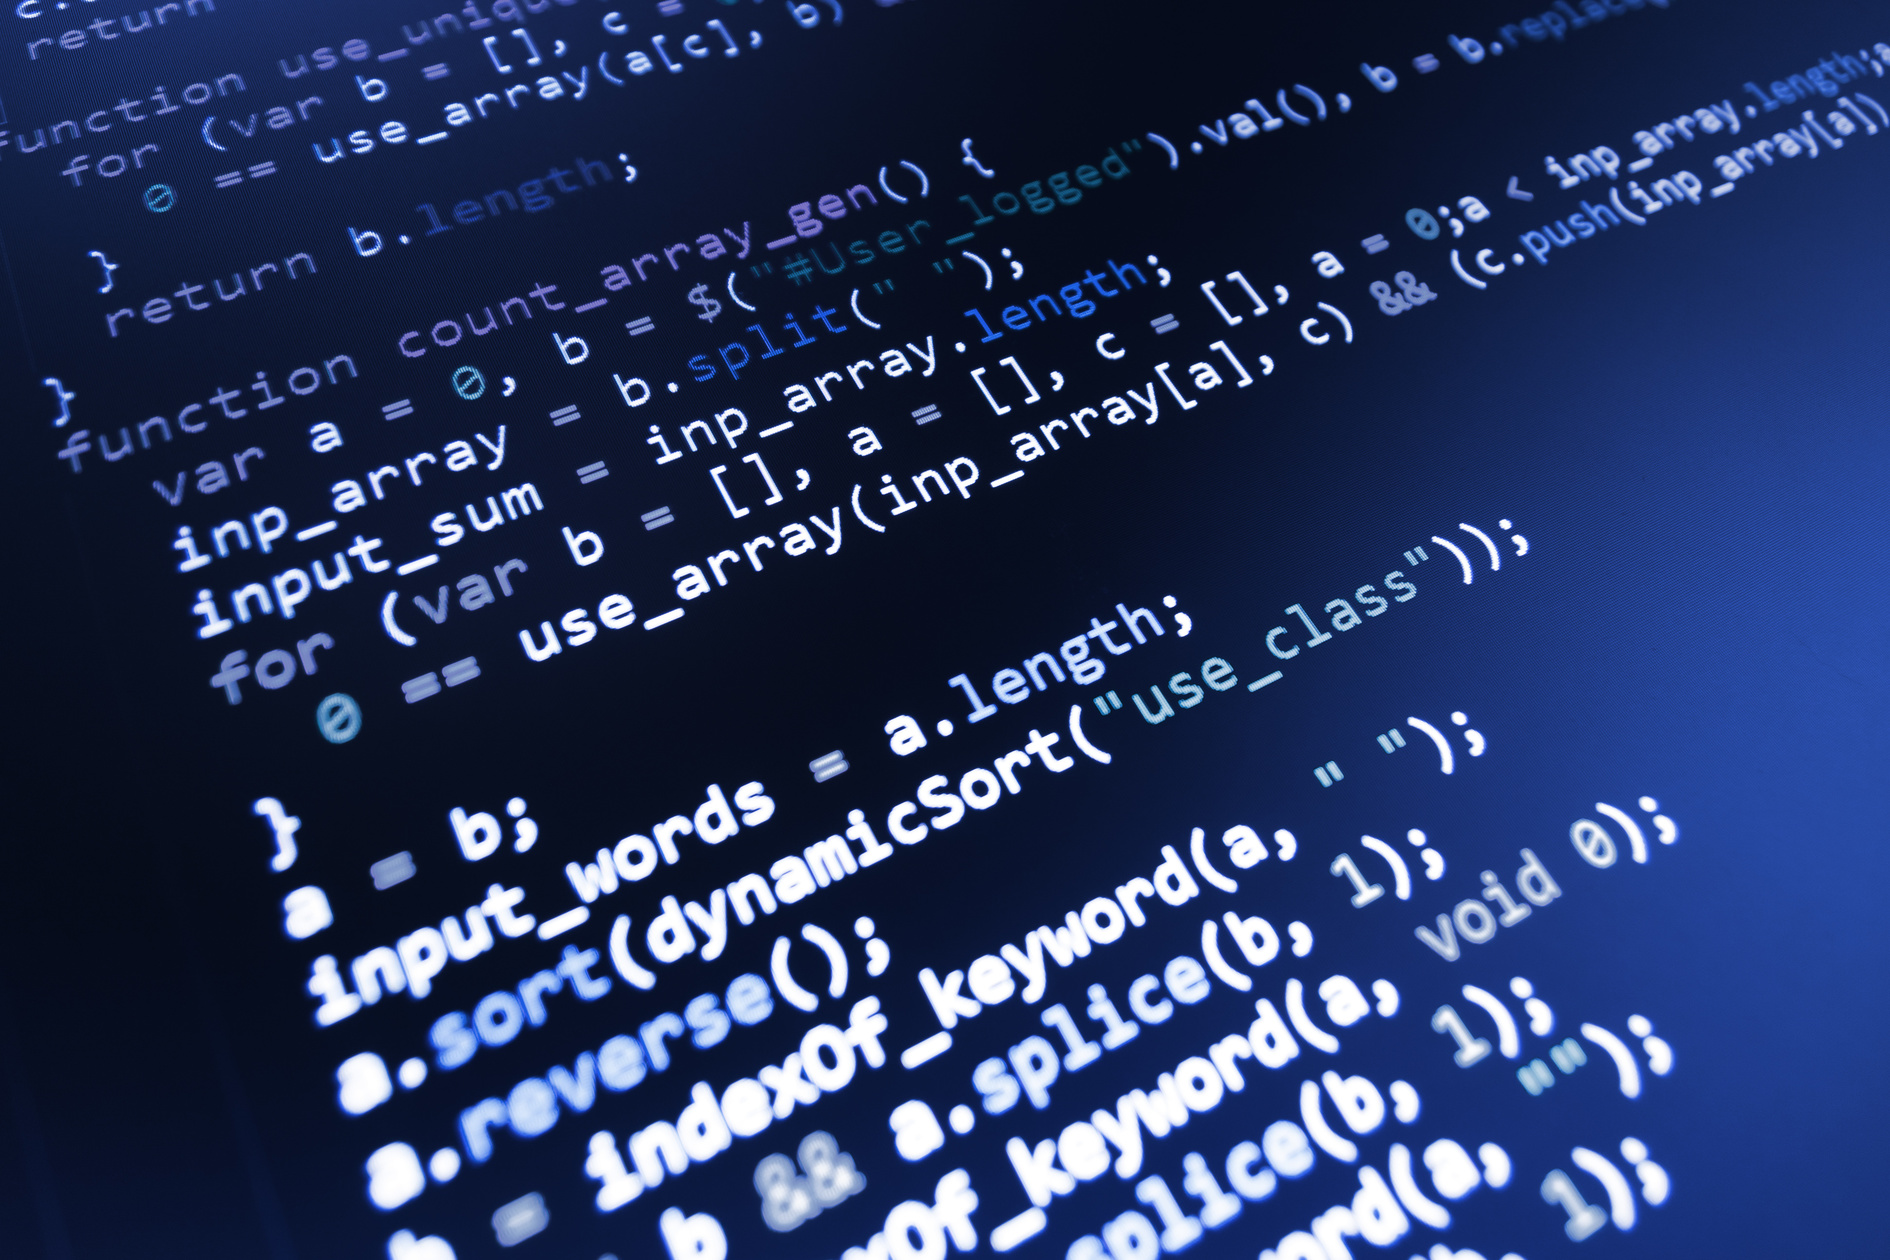 【PHP初心者向け】特定の文字列を含むかをチェックする方法